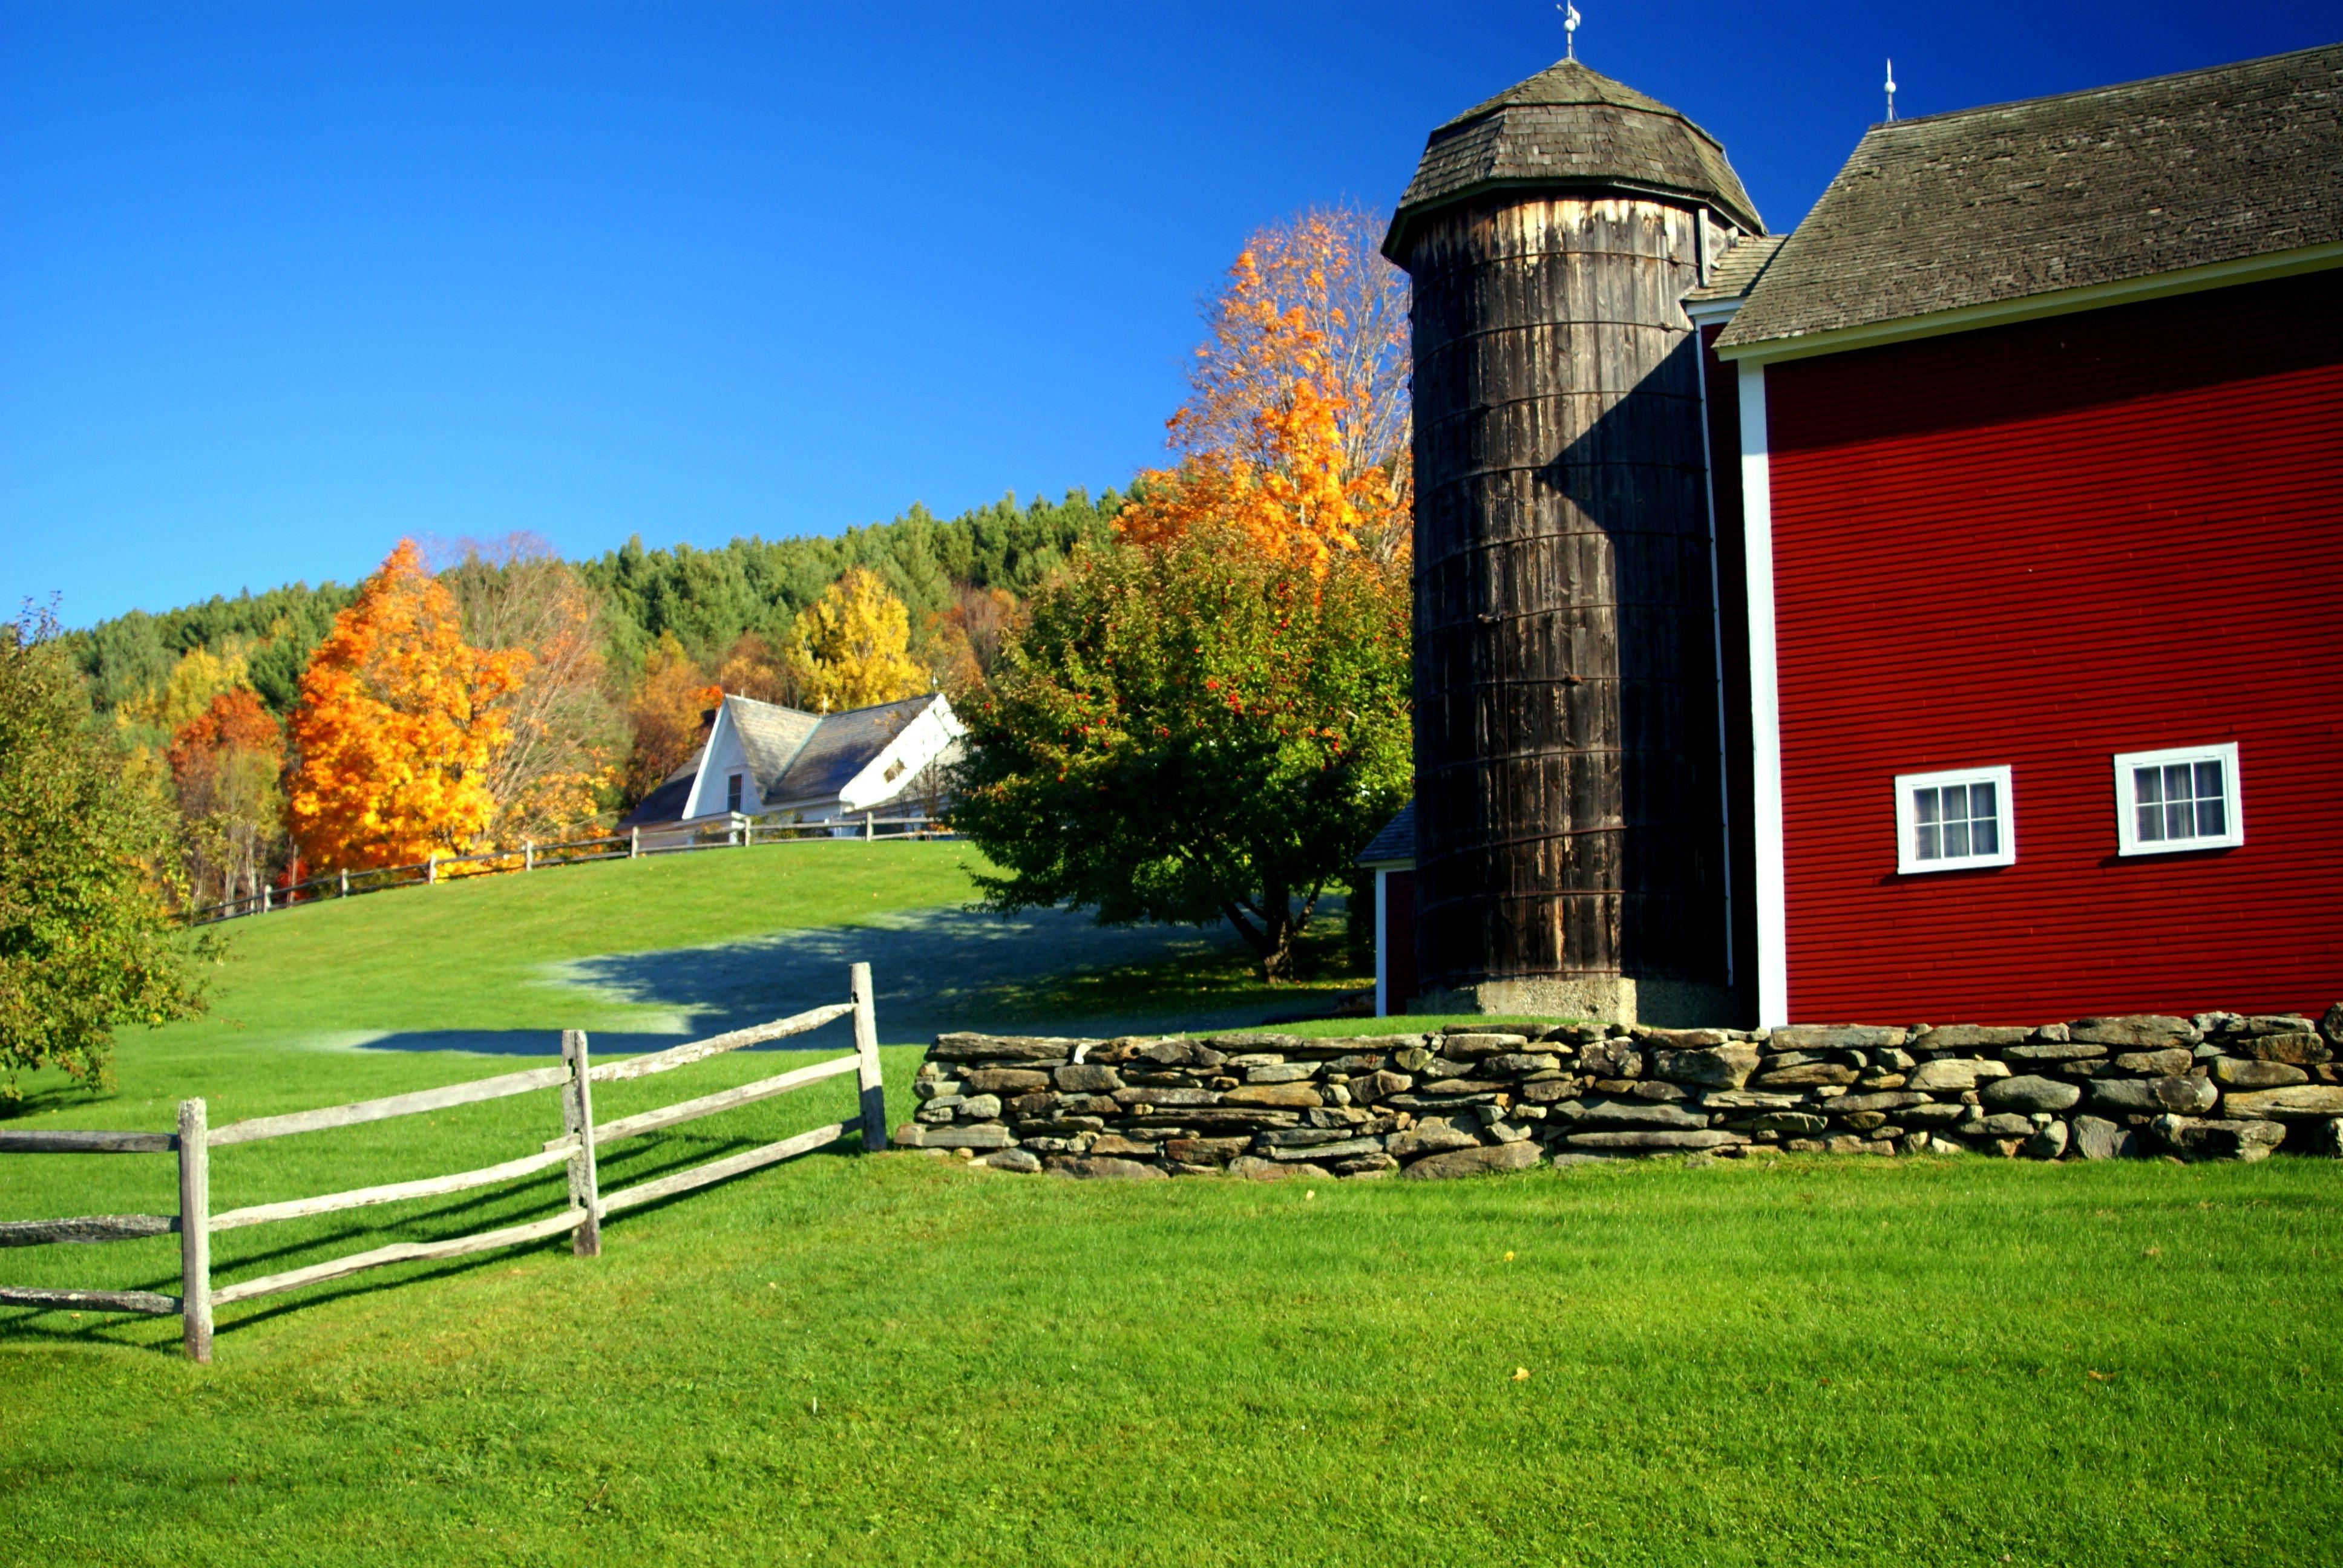 Woodstock VT Area - Honey Hill Farm - A Classic Vermont Hilltop Farm